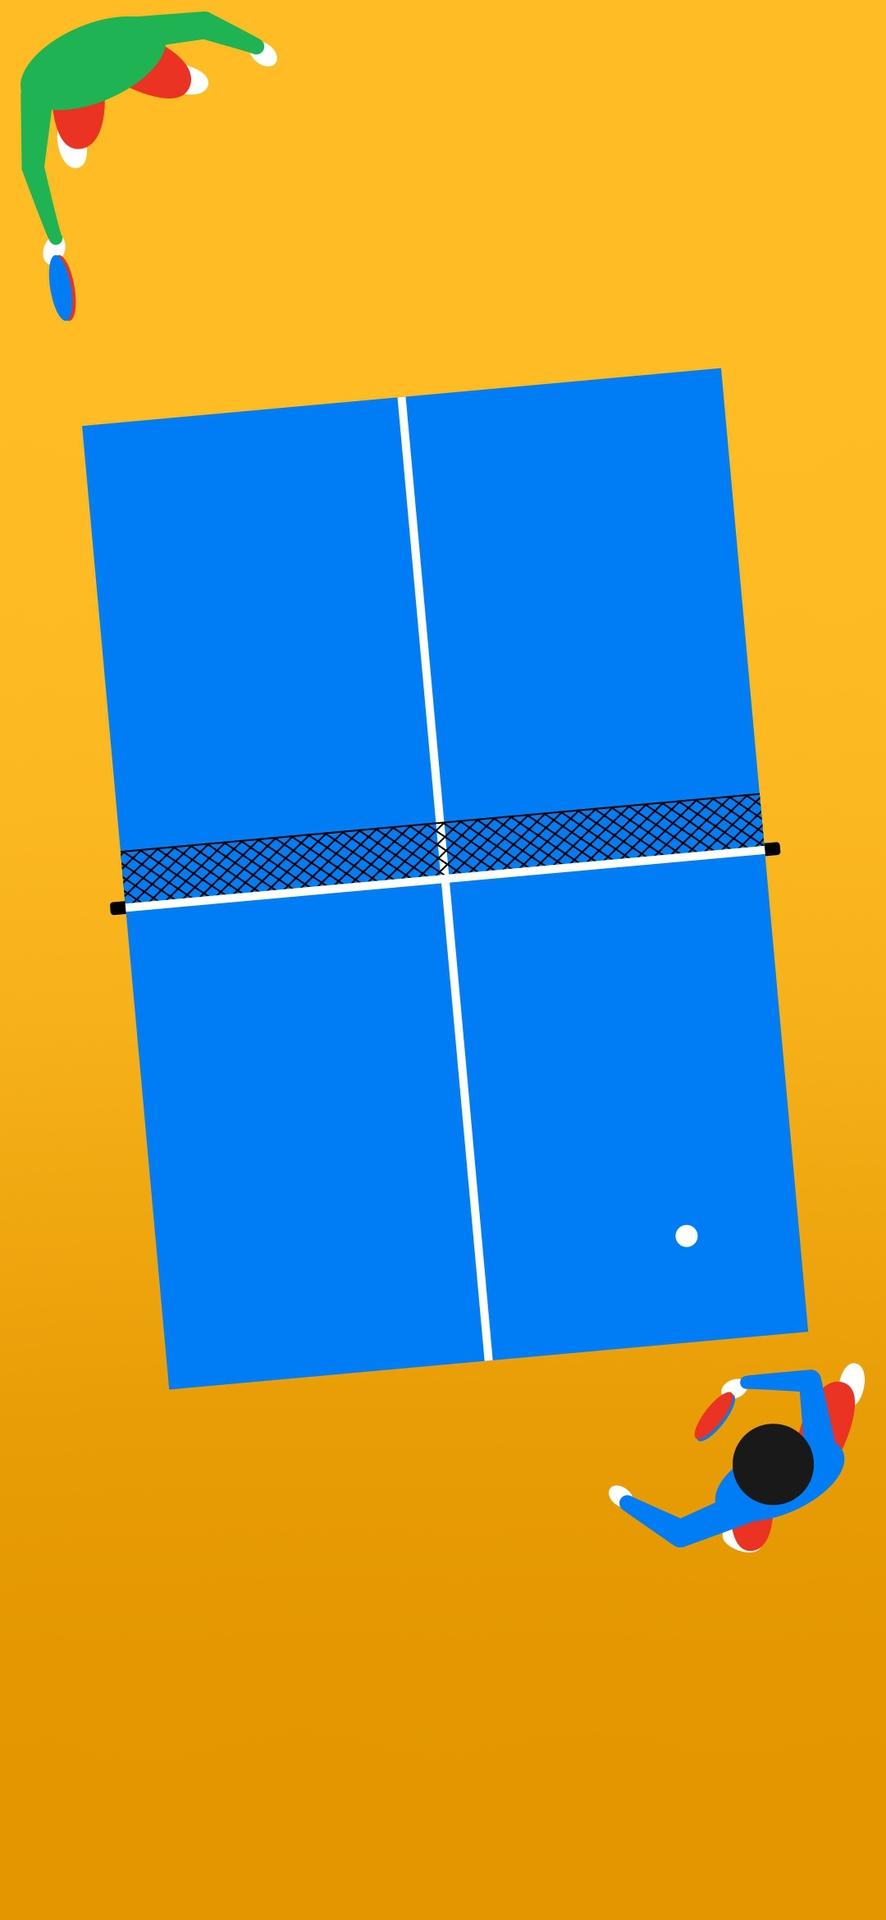 Google Pixel 4a wallpapers 9